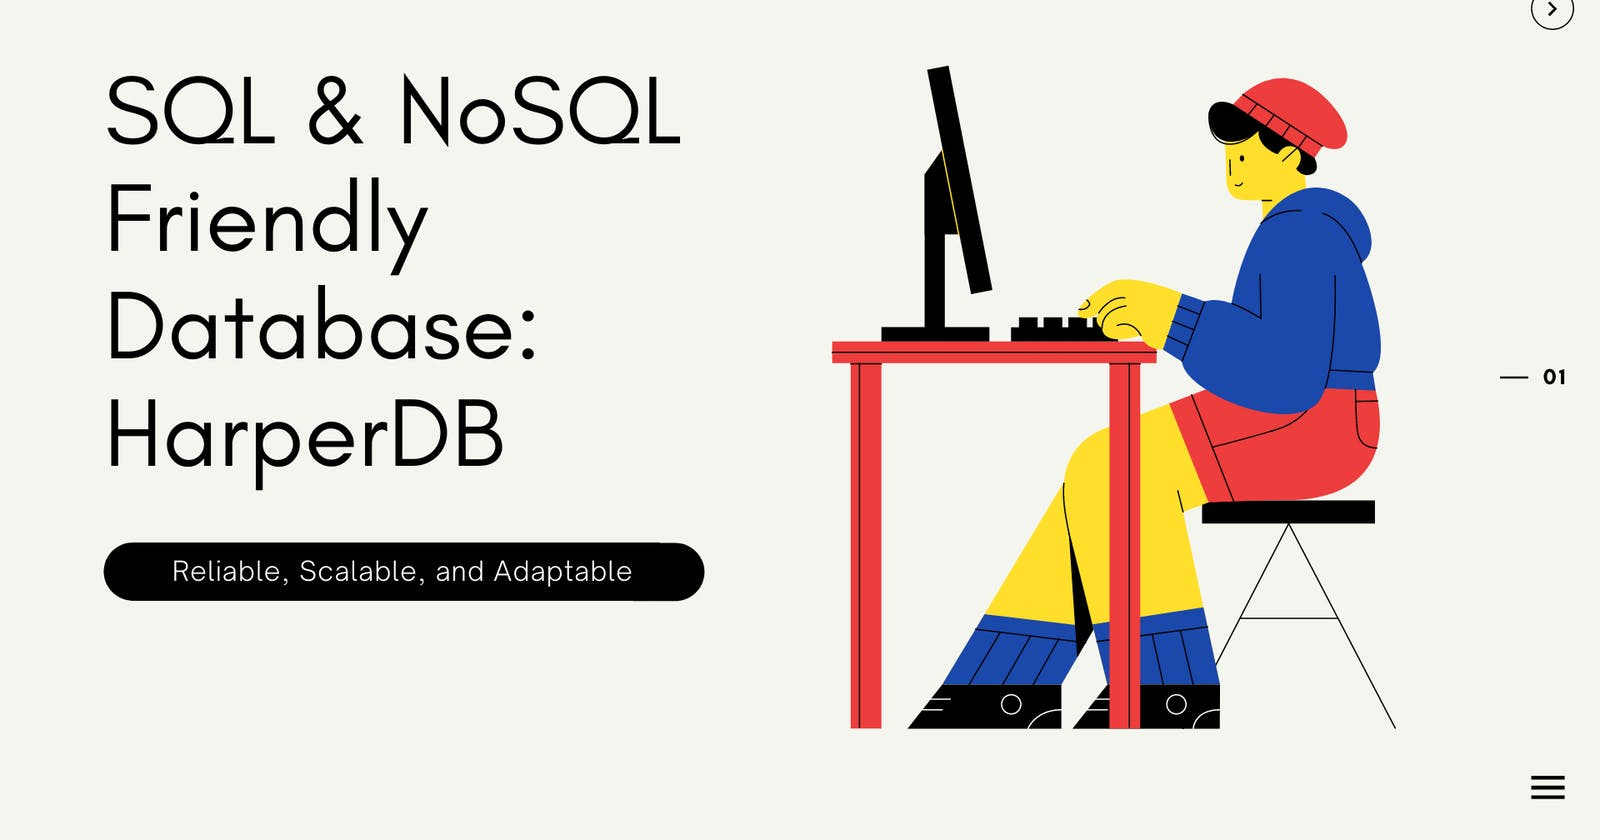 SQL & NoSQL Friendly Database- HarperDB